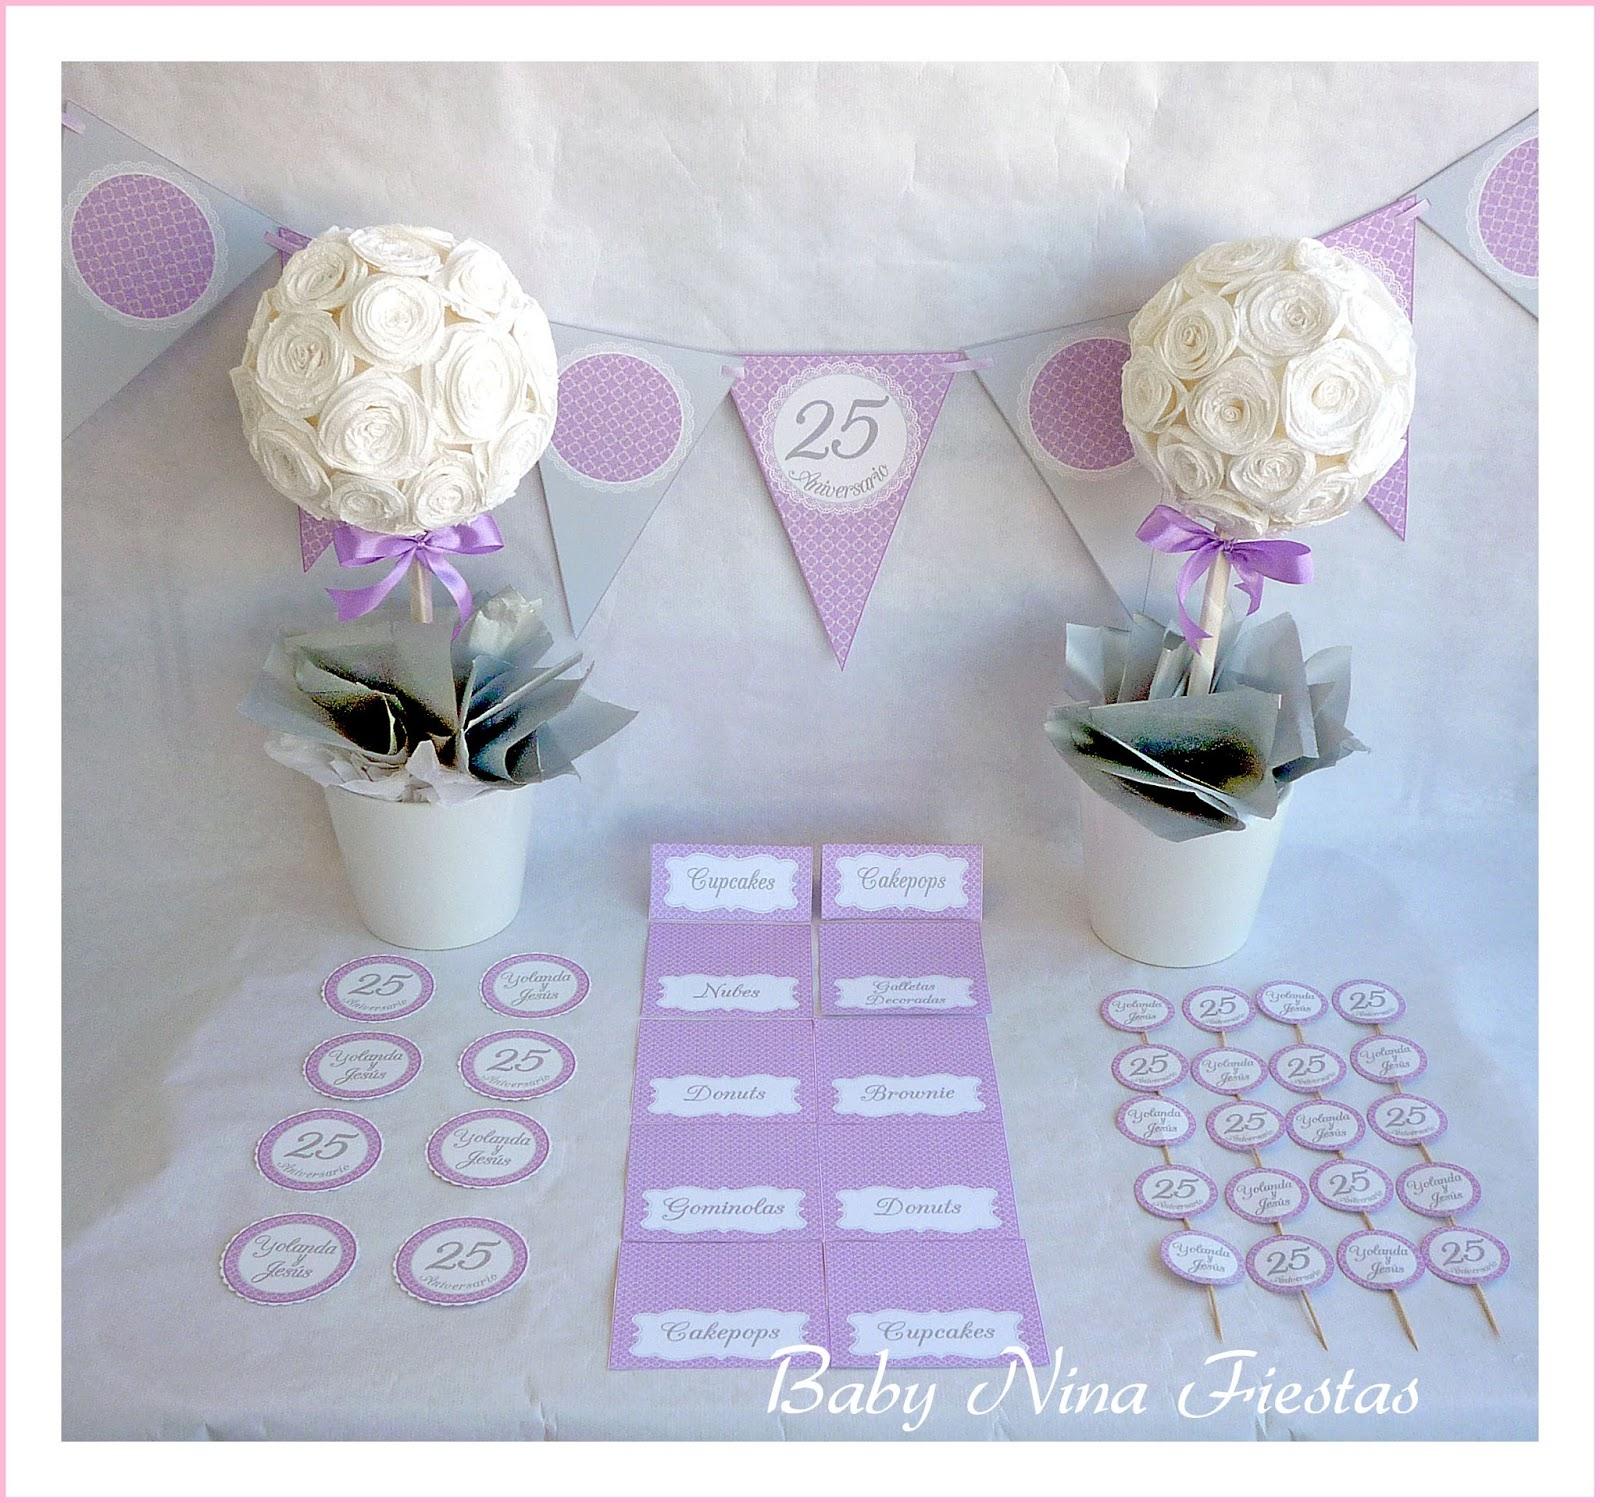 Baby nina fiestas papeler a personalizada y decoraci n for Fotos de mesas de chuches para bodas